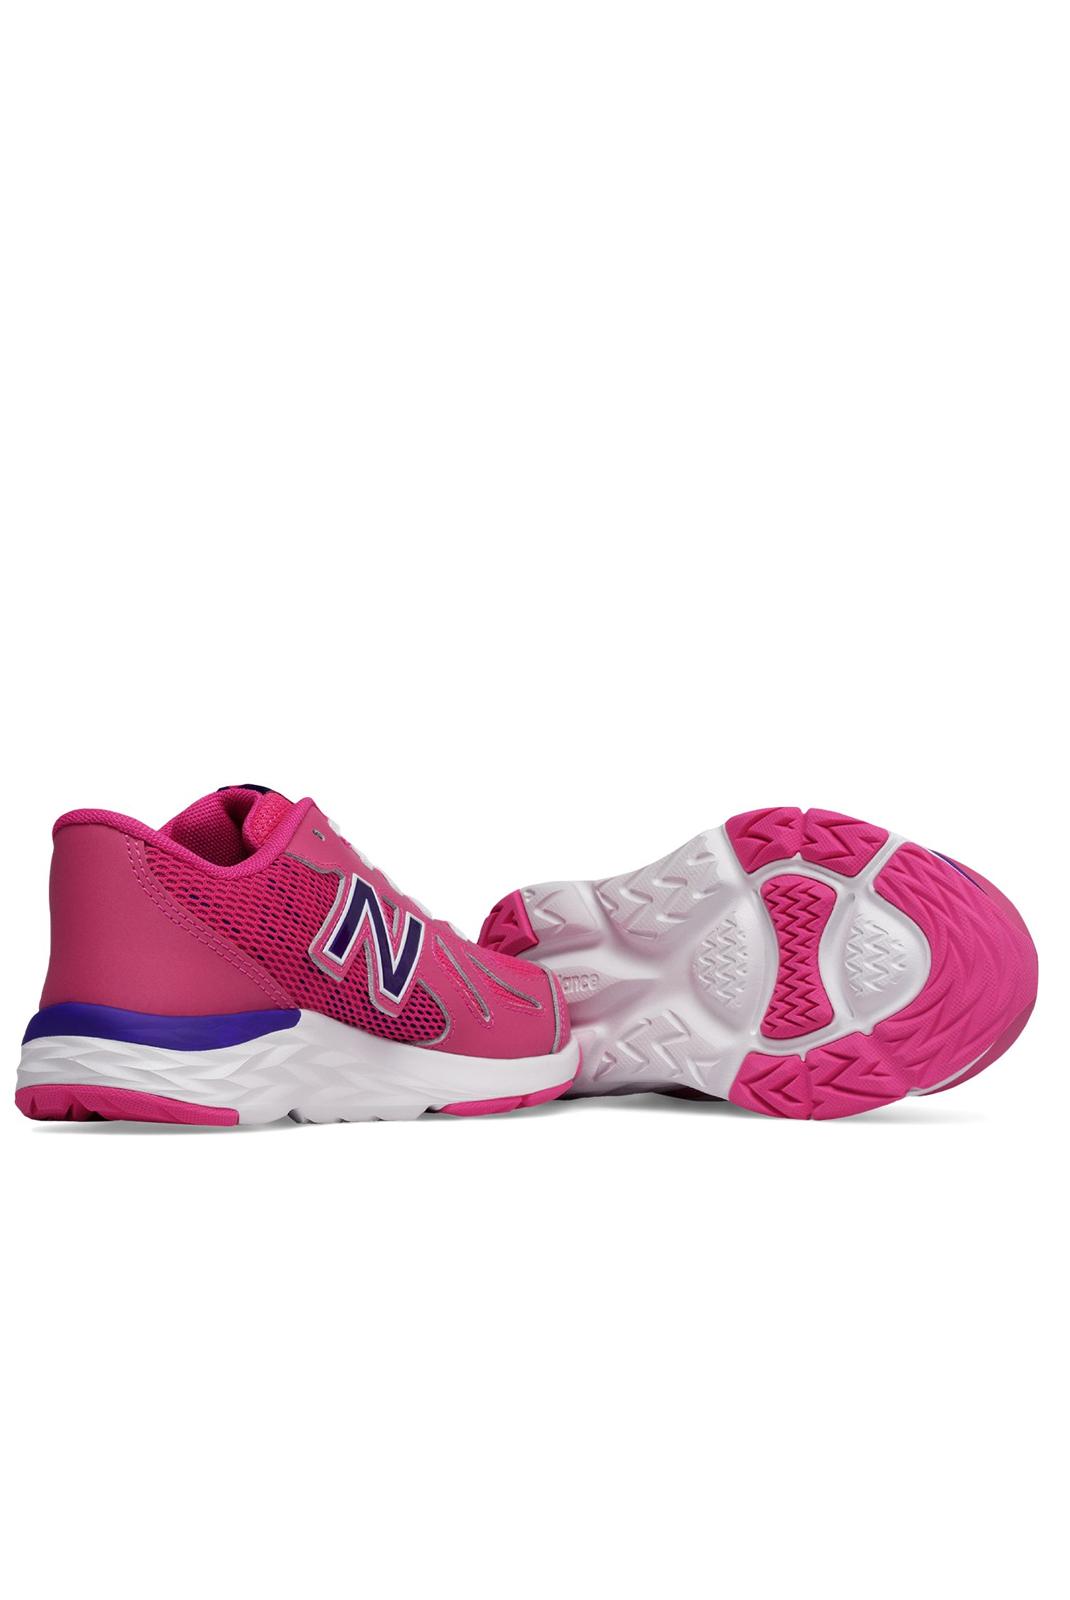 Baskets / Sneakers  New balance KJ790PIY rose